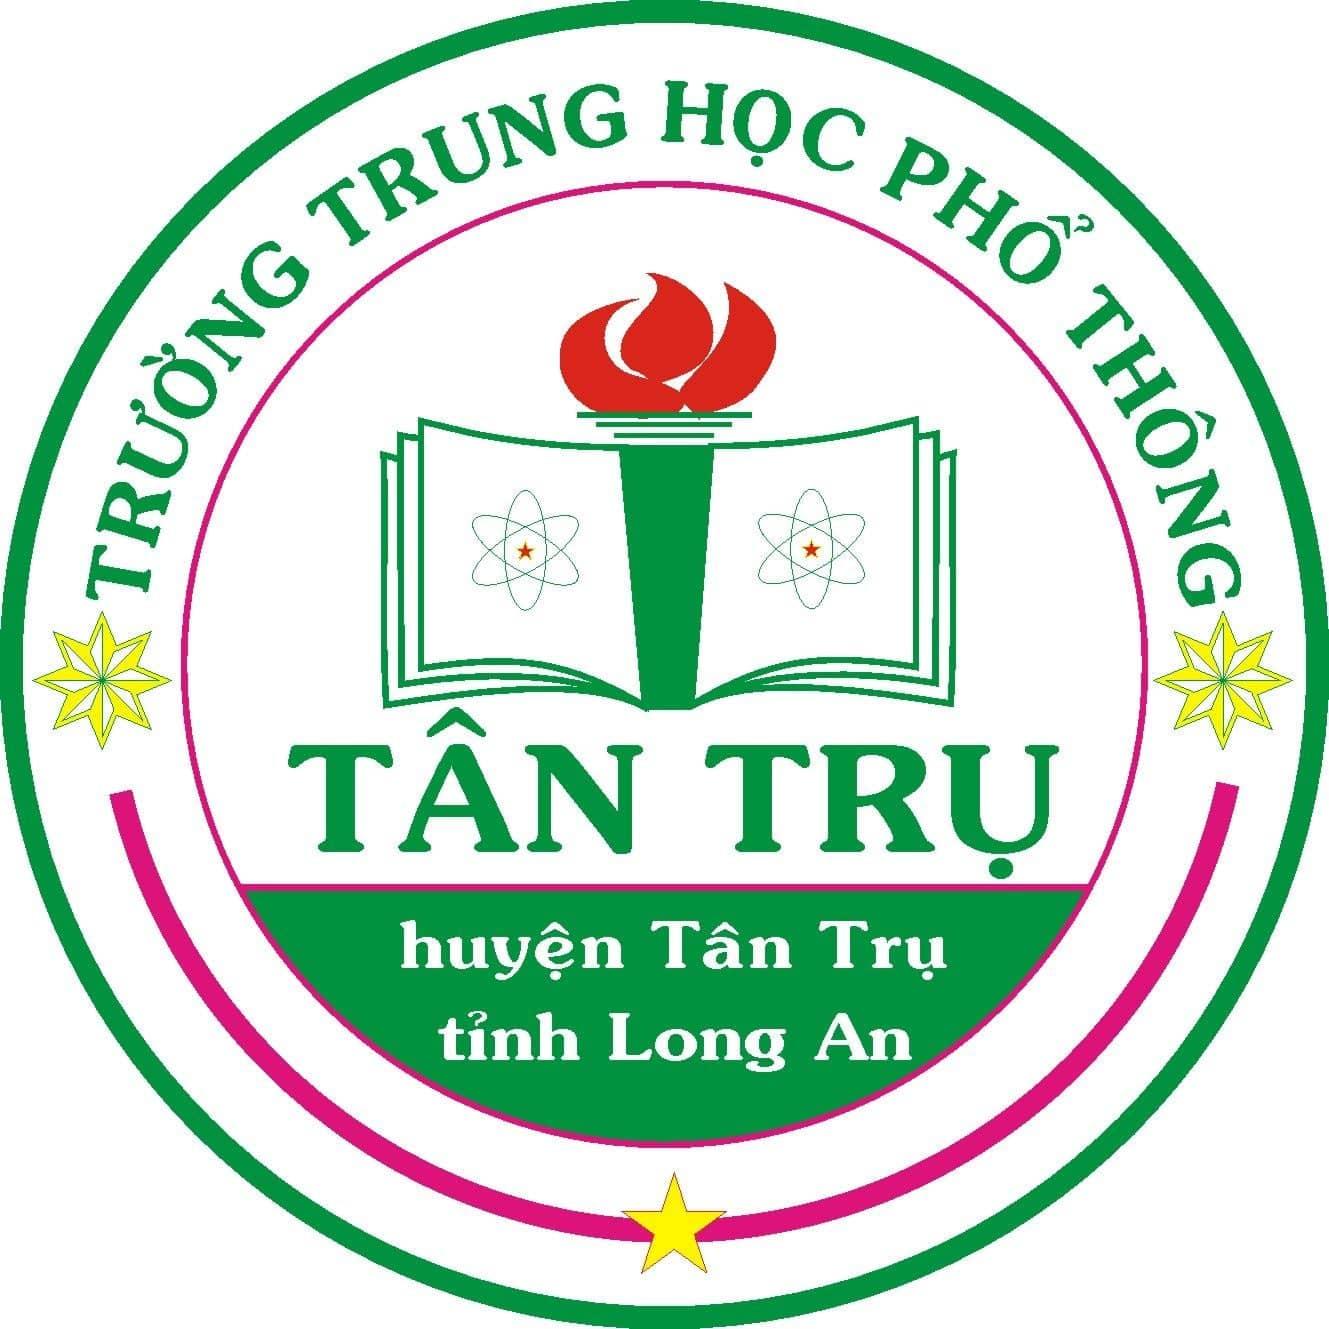 DIA LI-LOP 12-BAI 31-THPT TÂN TRU-TINH LONG AN